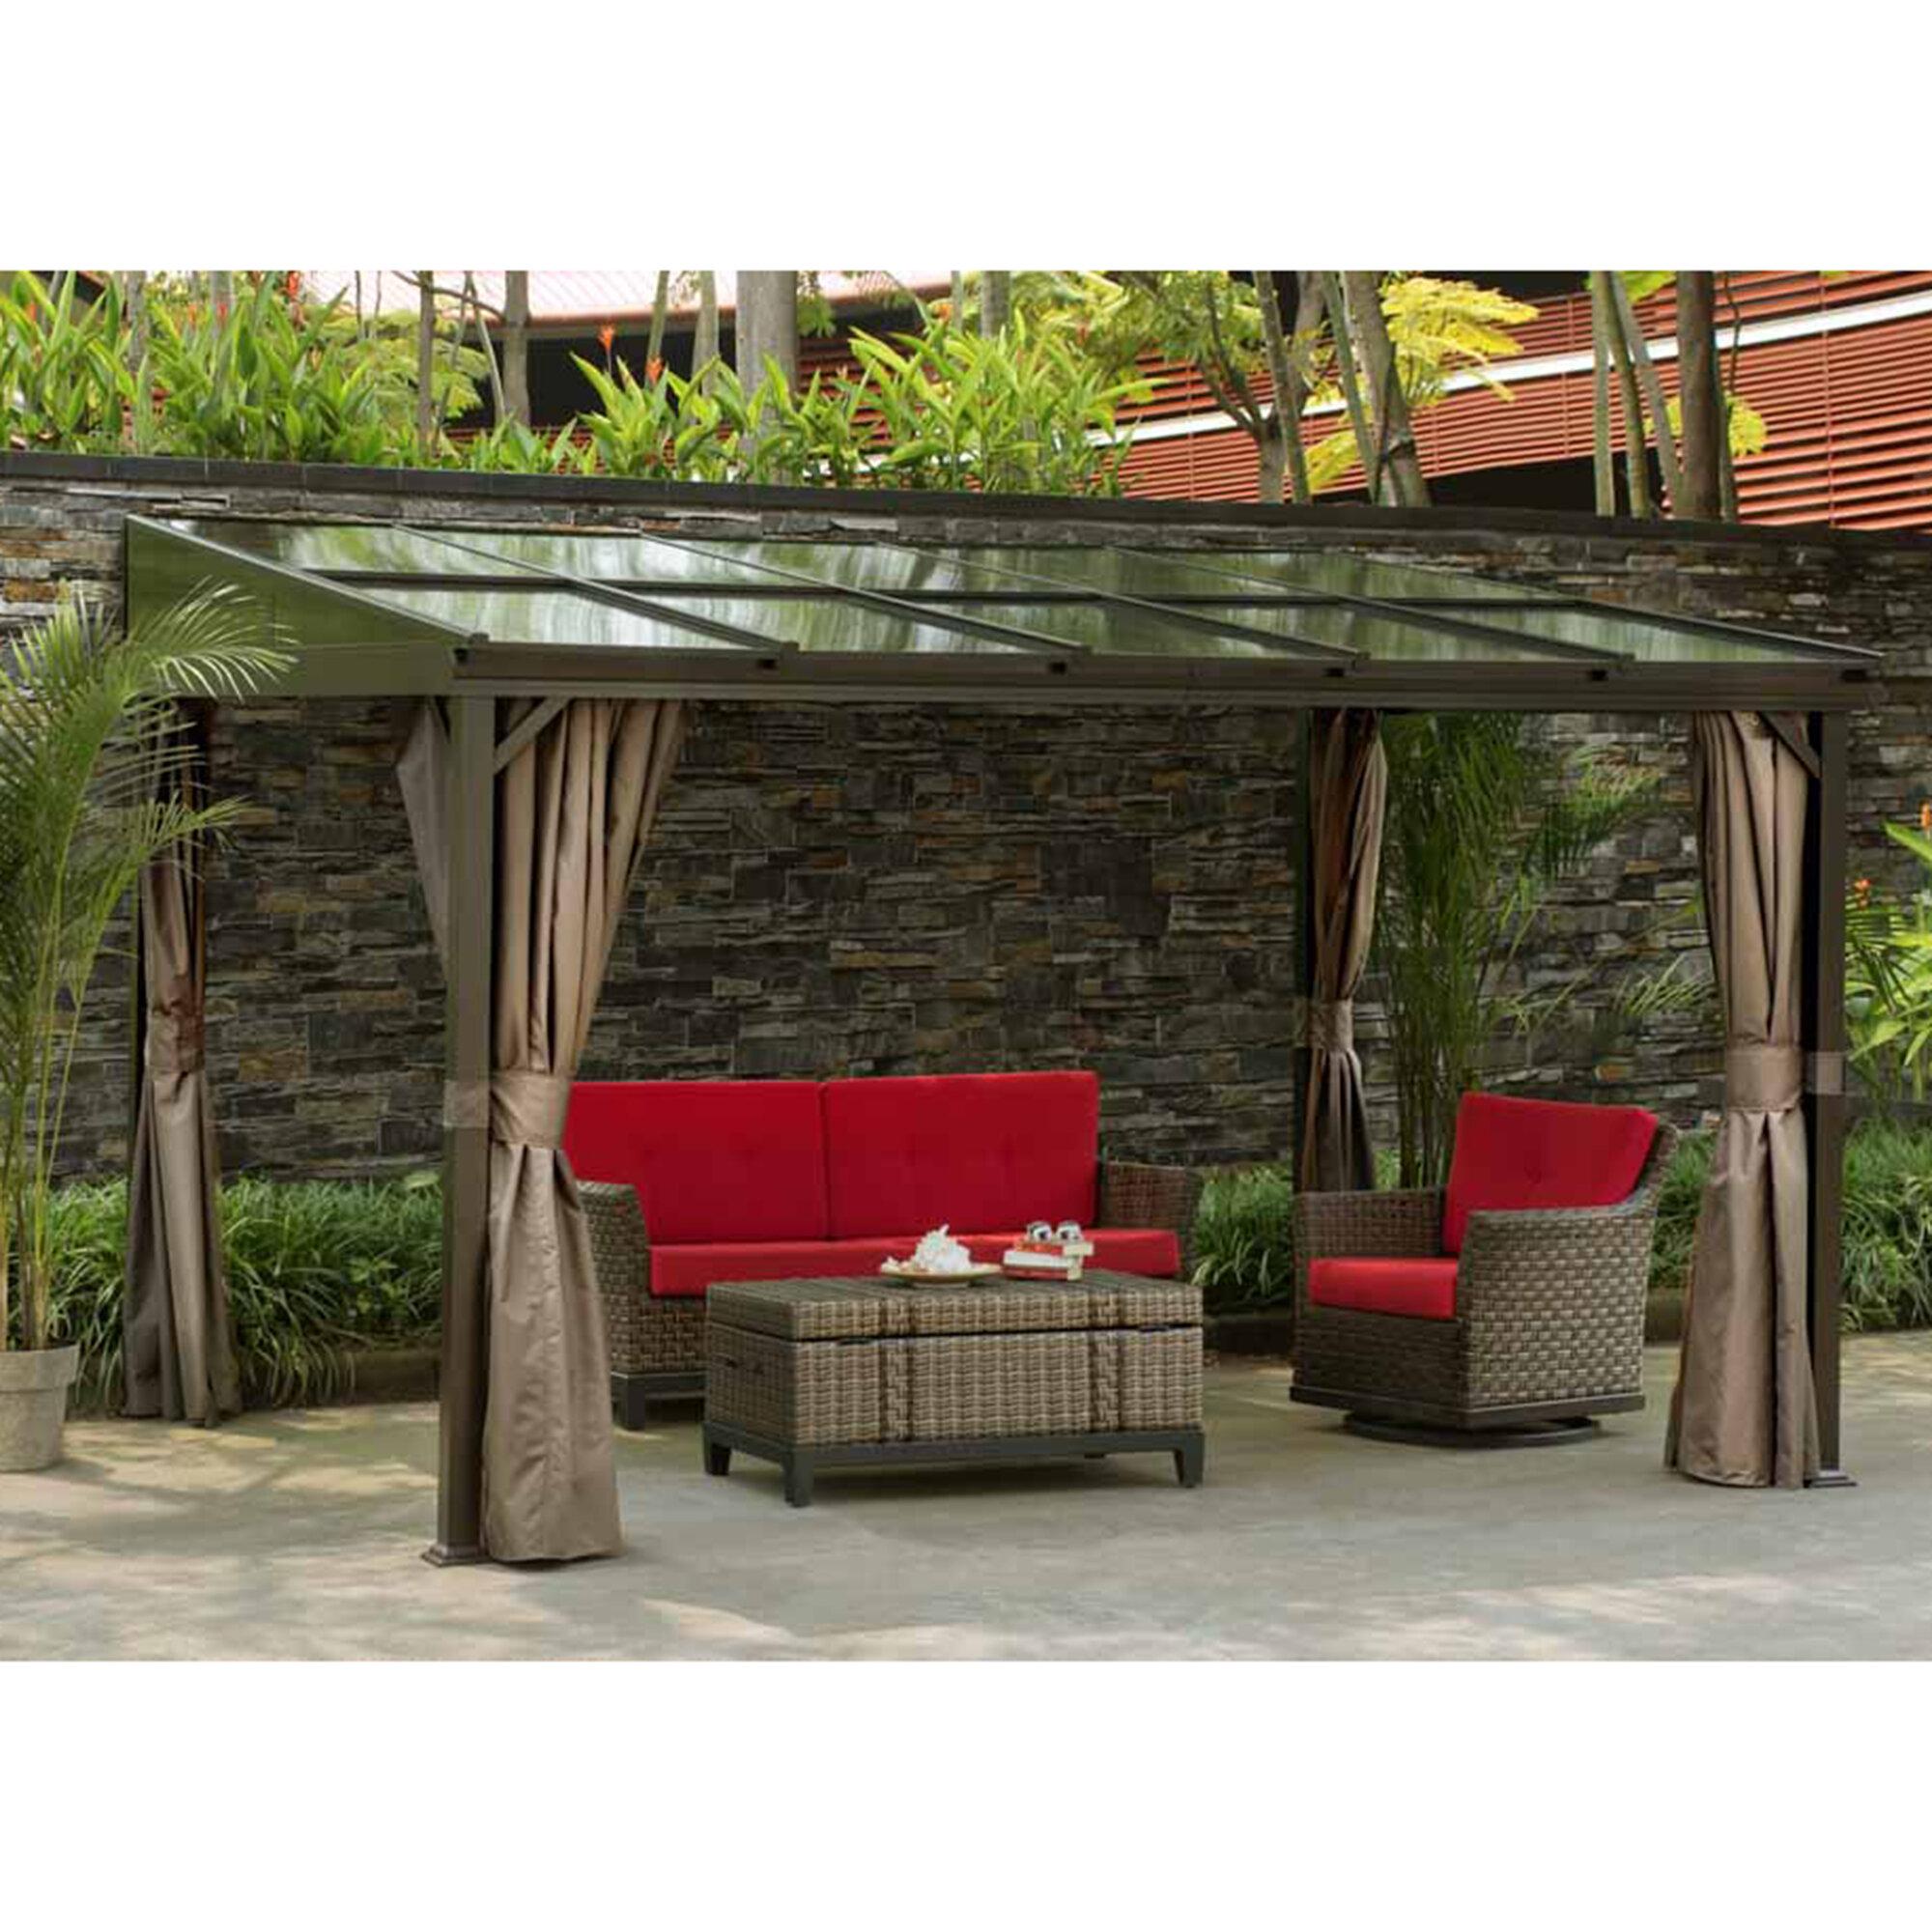 Sunjoy 12 ft w x 10 ft d aluminum wall mounted patio gazebo wayfair